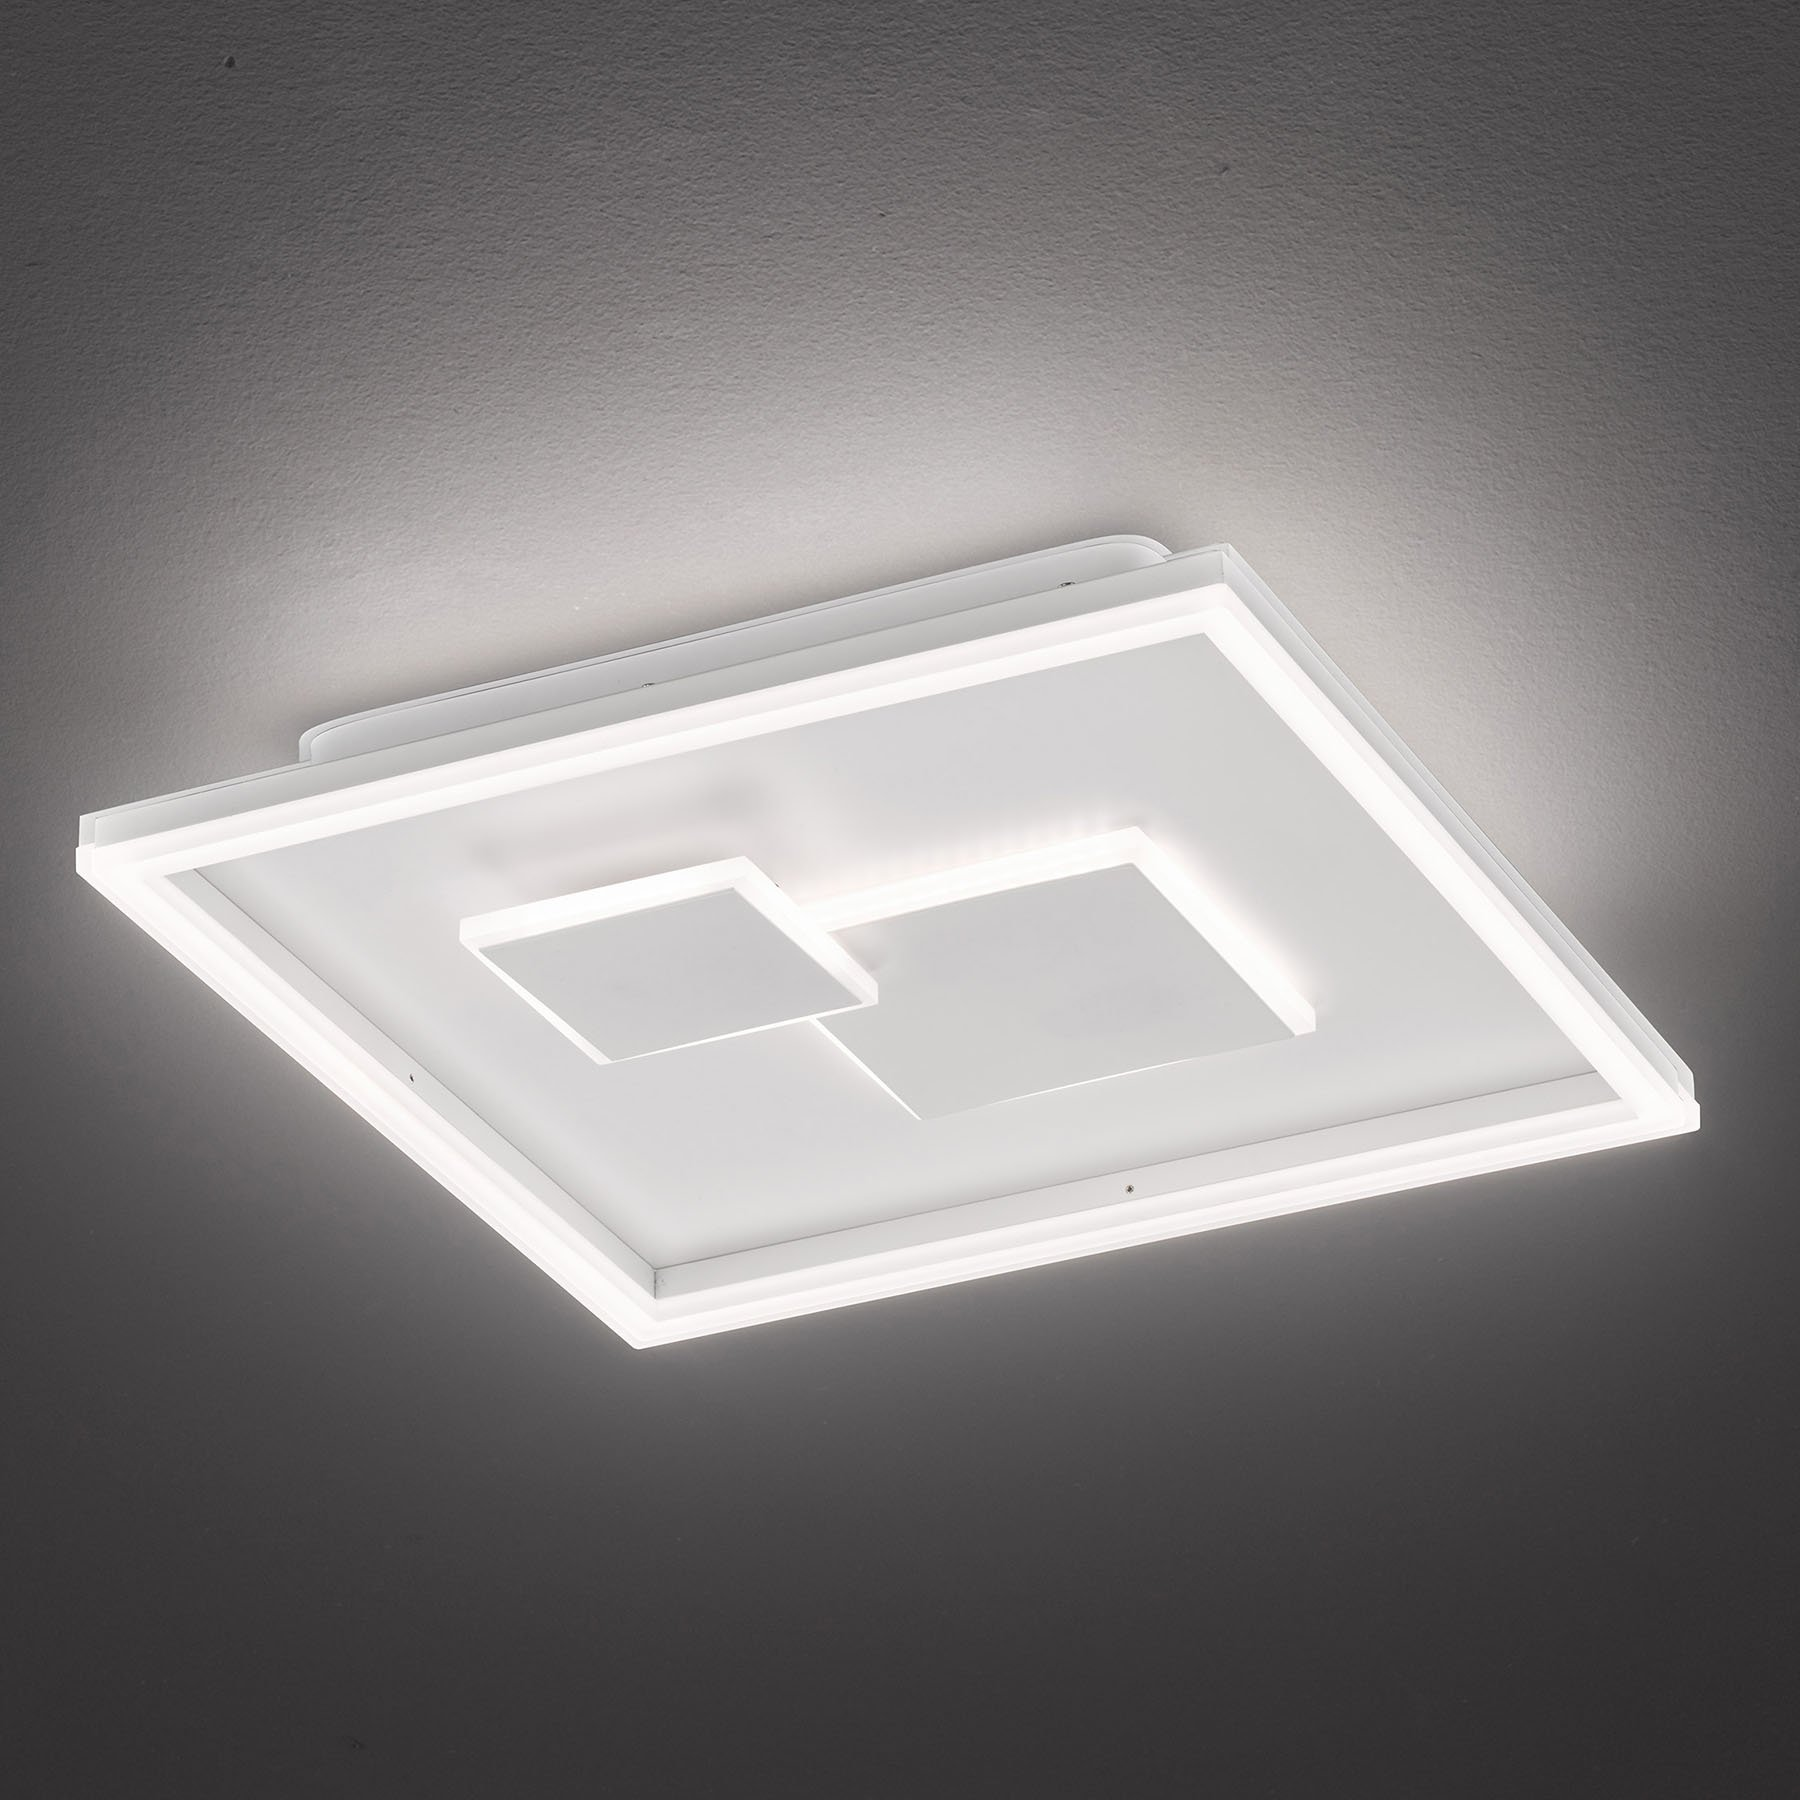 LED-taklampe Nadra, dimbar i tre trinn, kantet